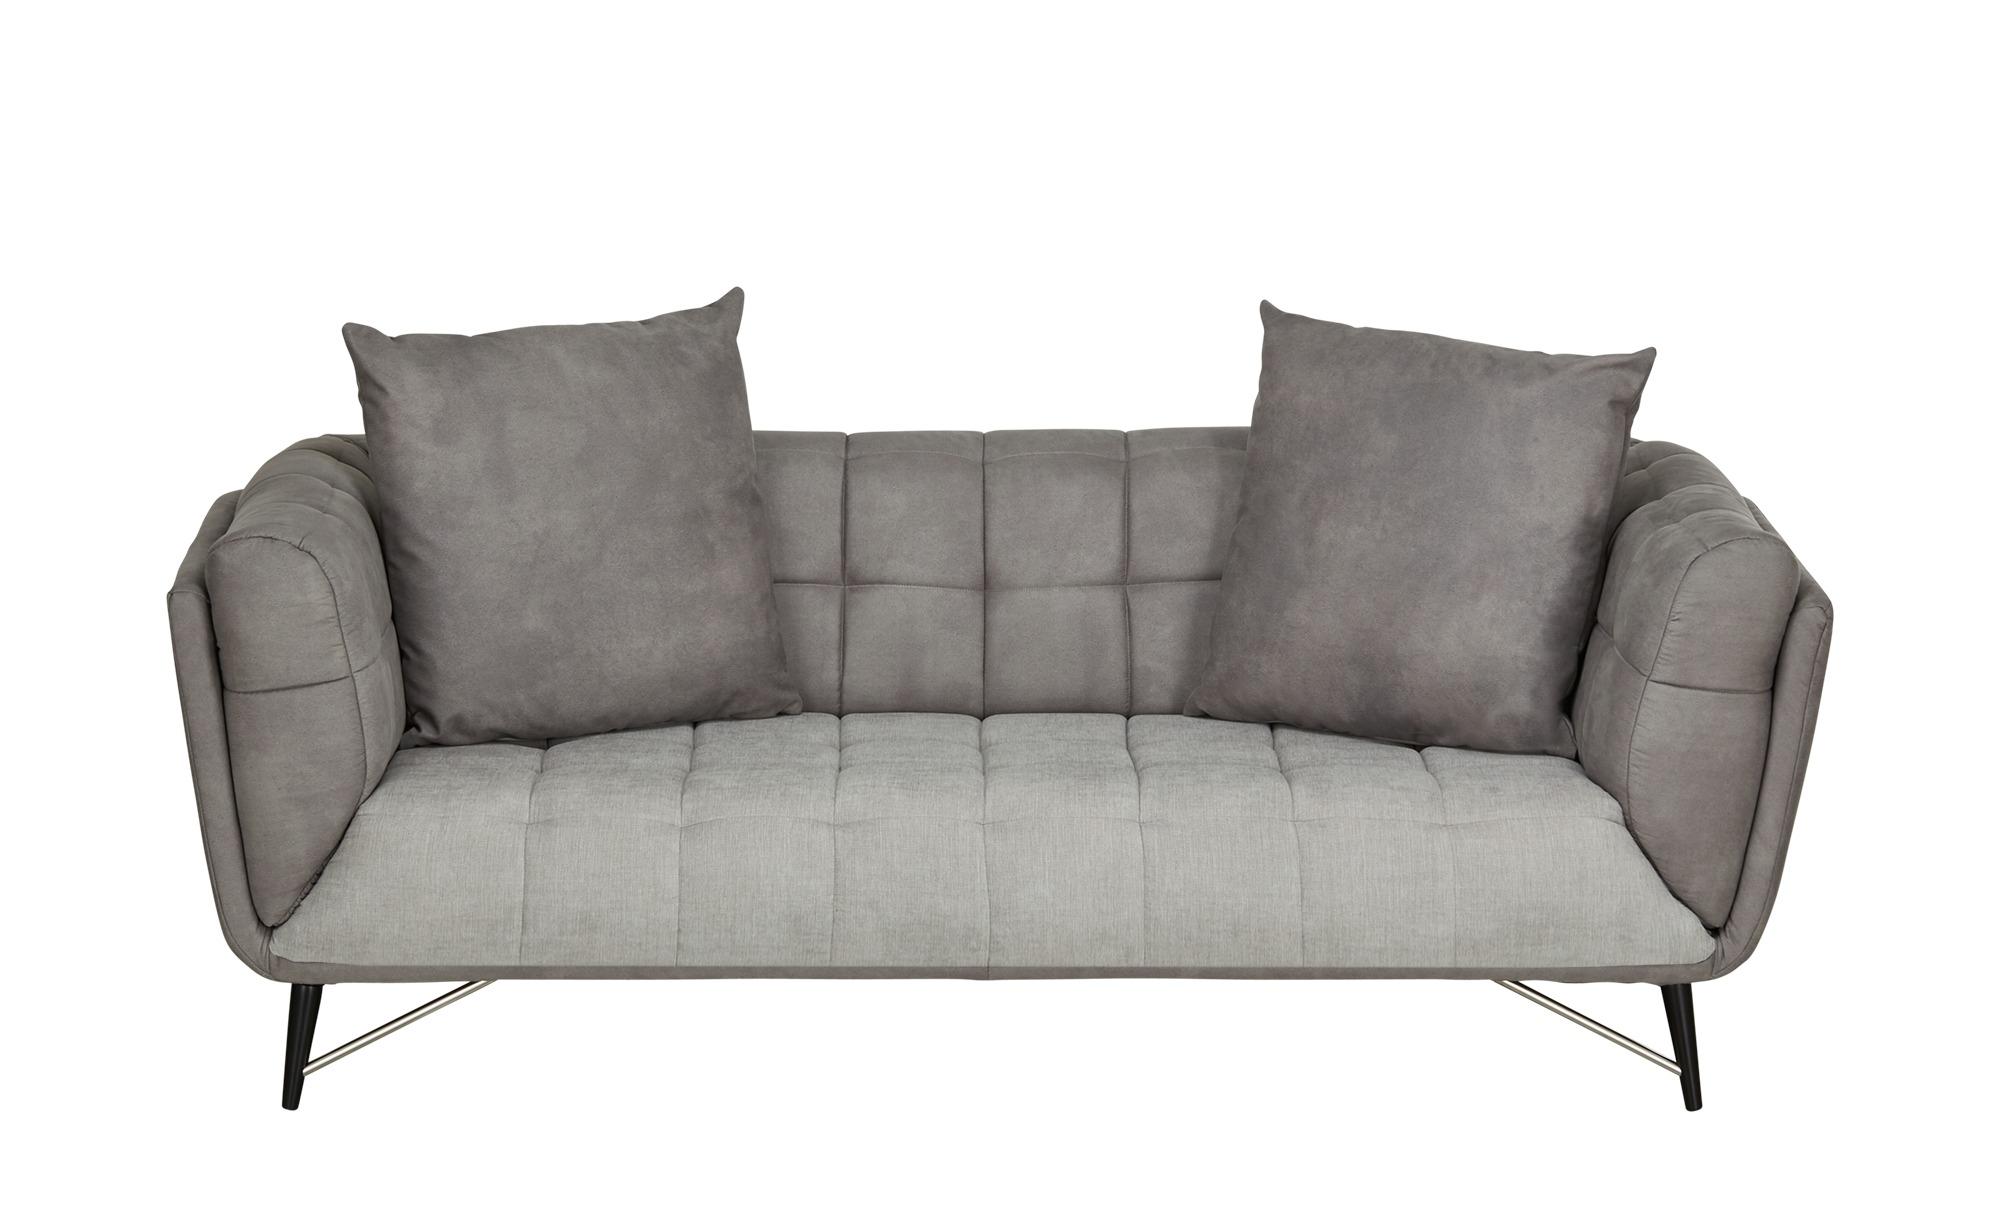 Big Sofa  Grünberg ¦ Maße (cm): B: 228 H: 83 T: 100 Polstermöbel > Sofas > Big-Sofas - Höffner